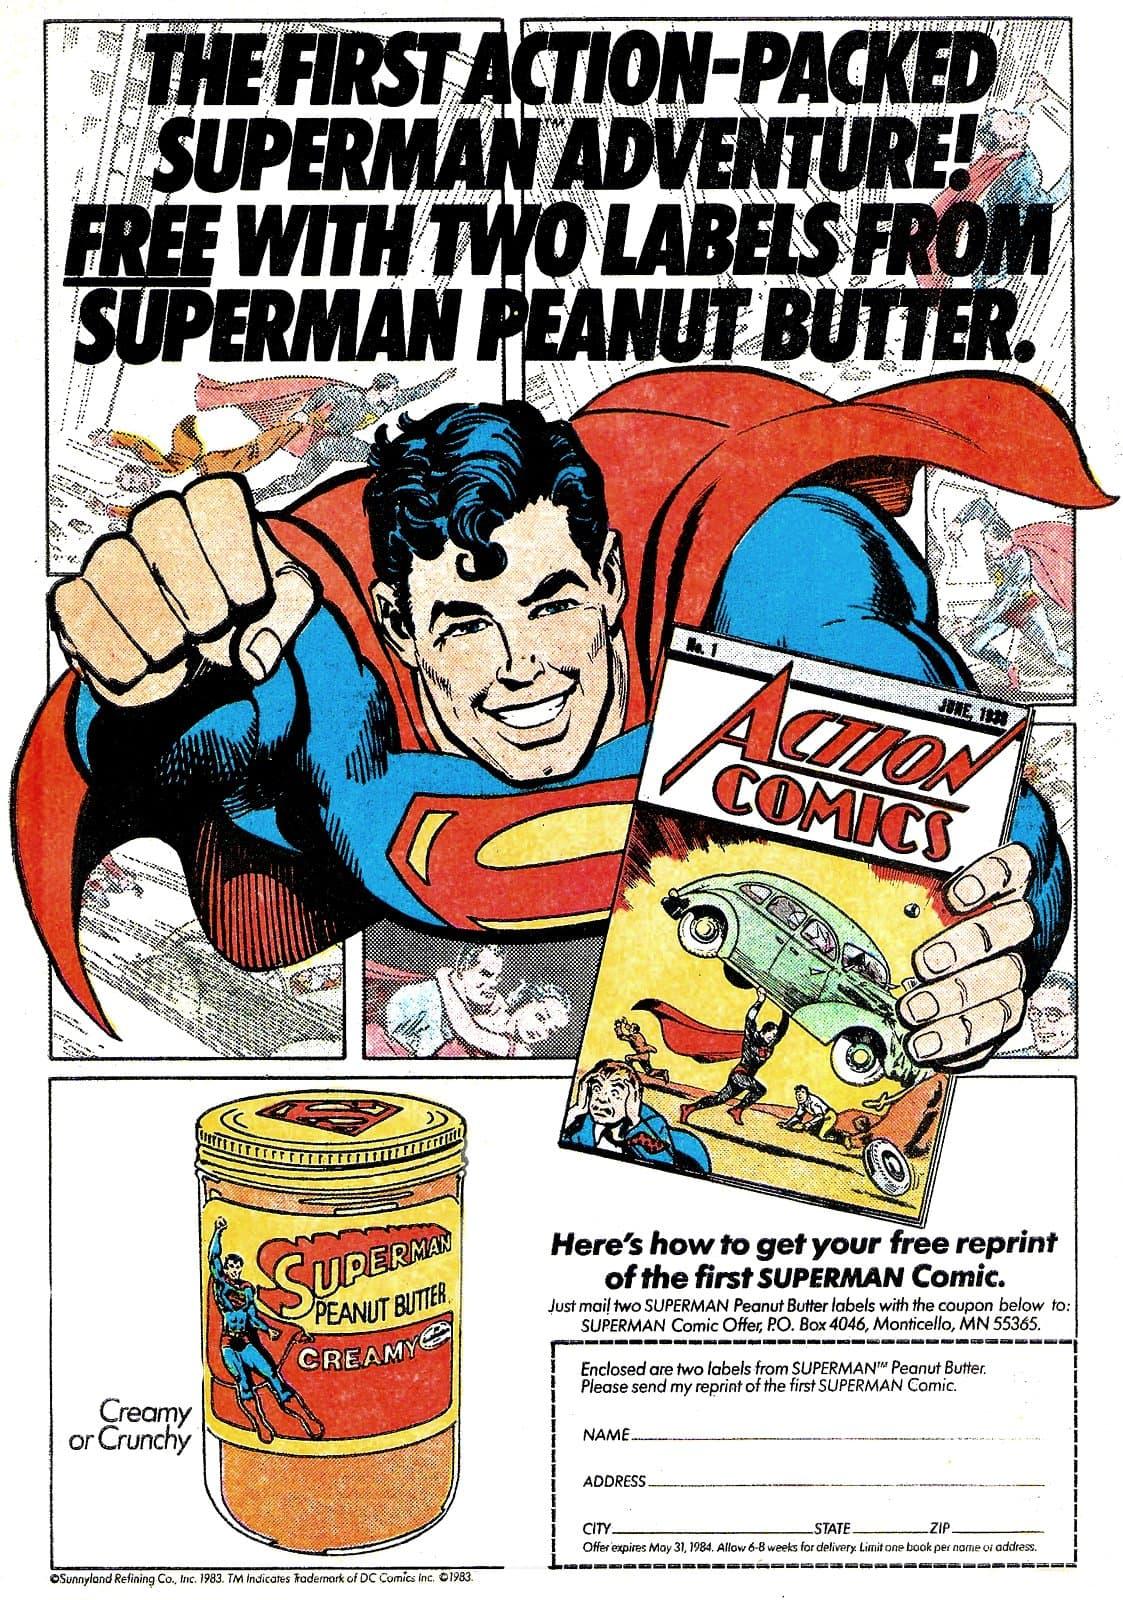 Vintage Superman Peanut Butter (1983)